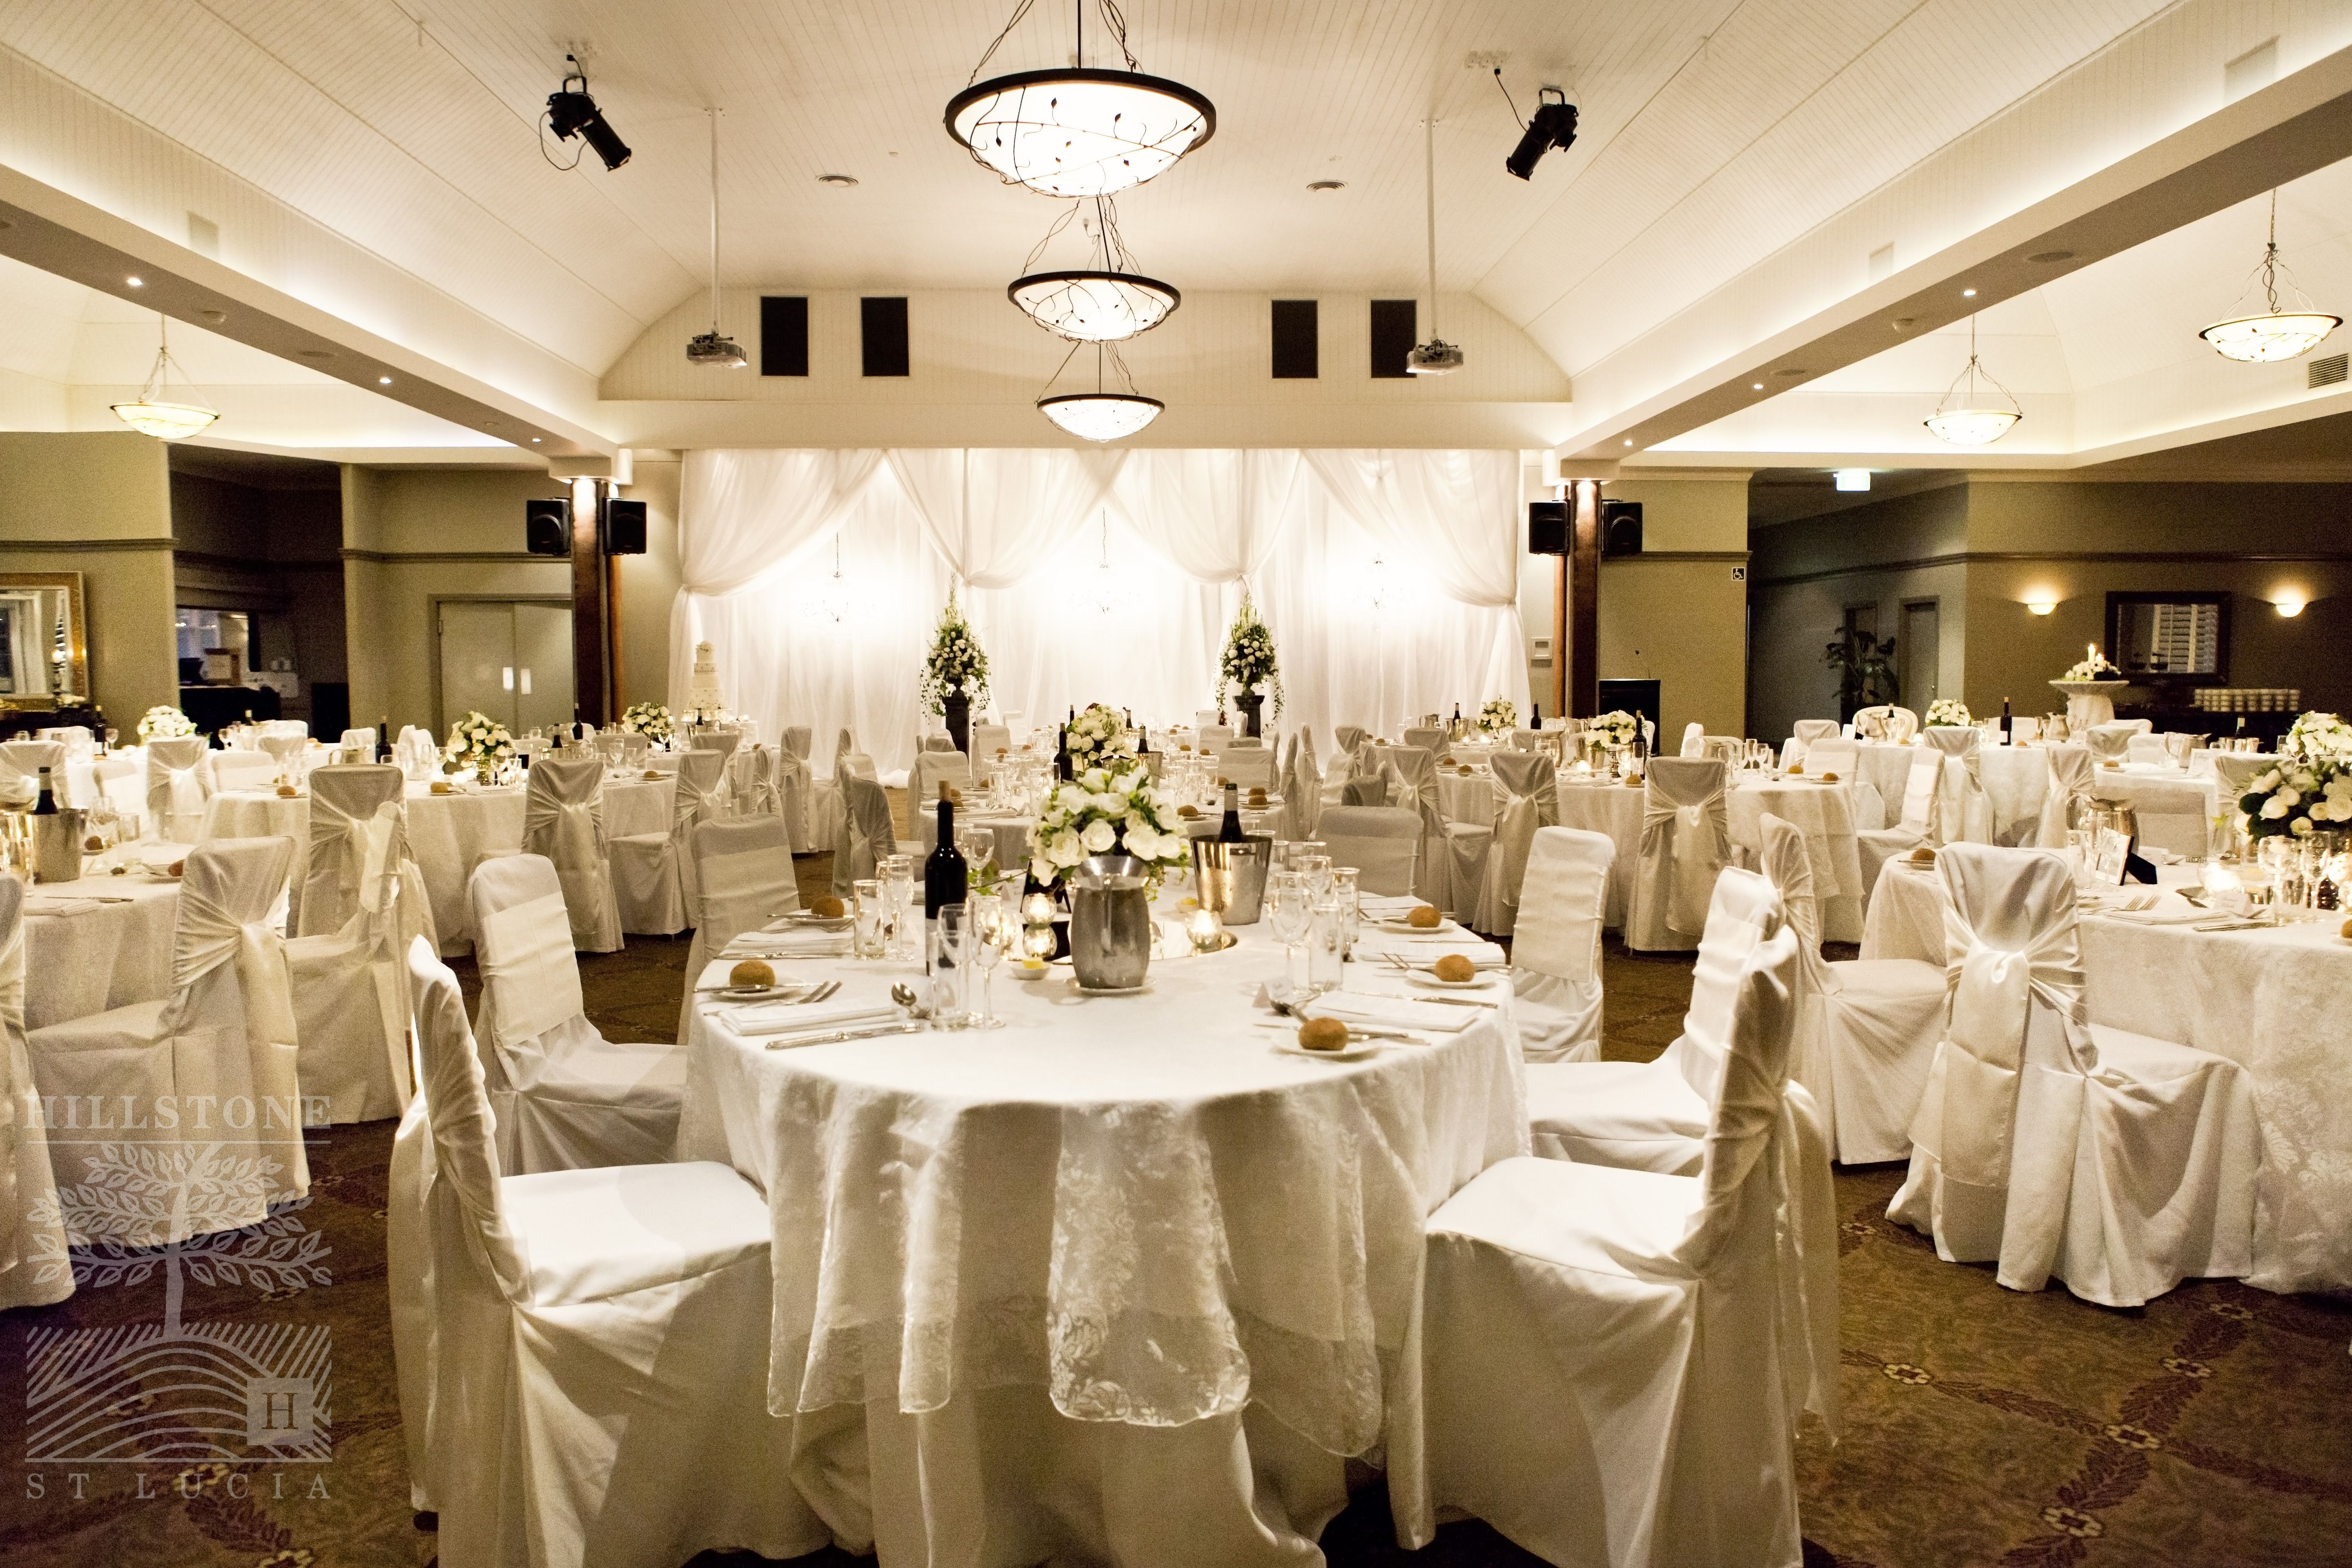 Wedding Brisbane Hillstone St Lucia Grand View Room